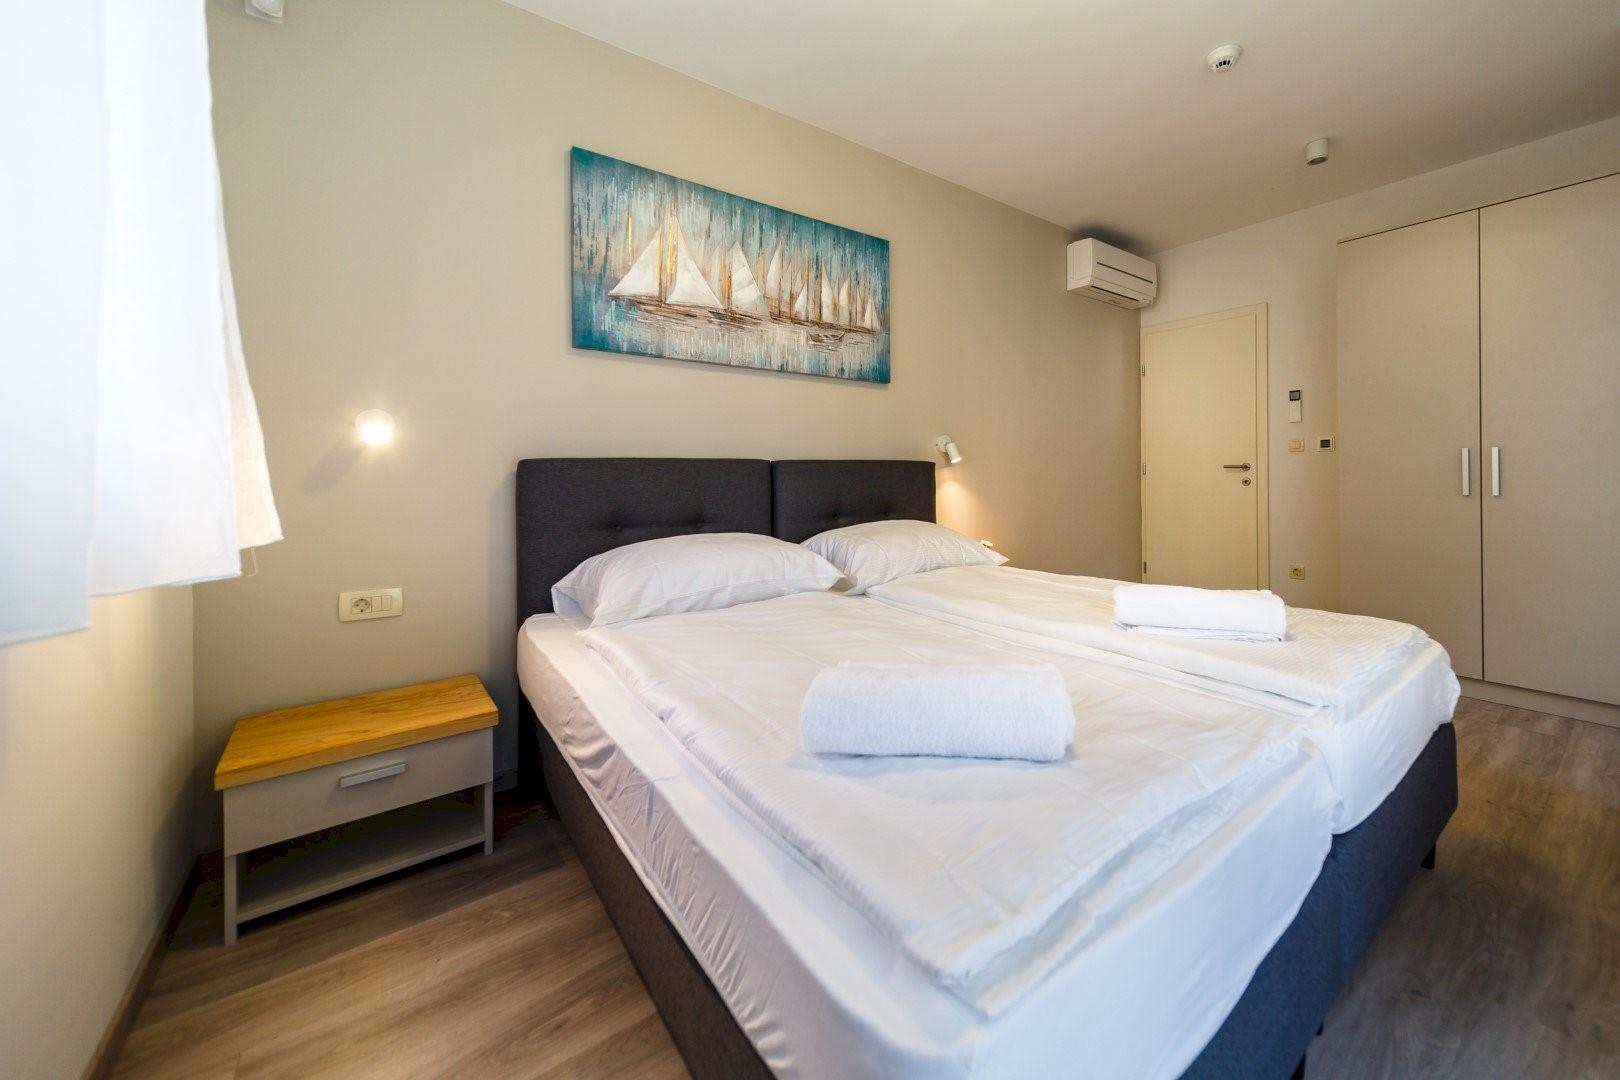 Ferienhaus Luxury Villa Loma 2 (2586643), Sveti Vid-Miholjice, Insel Krk, Kvarner, Kroatien, Bild 9